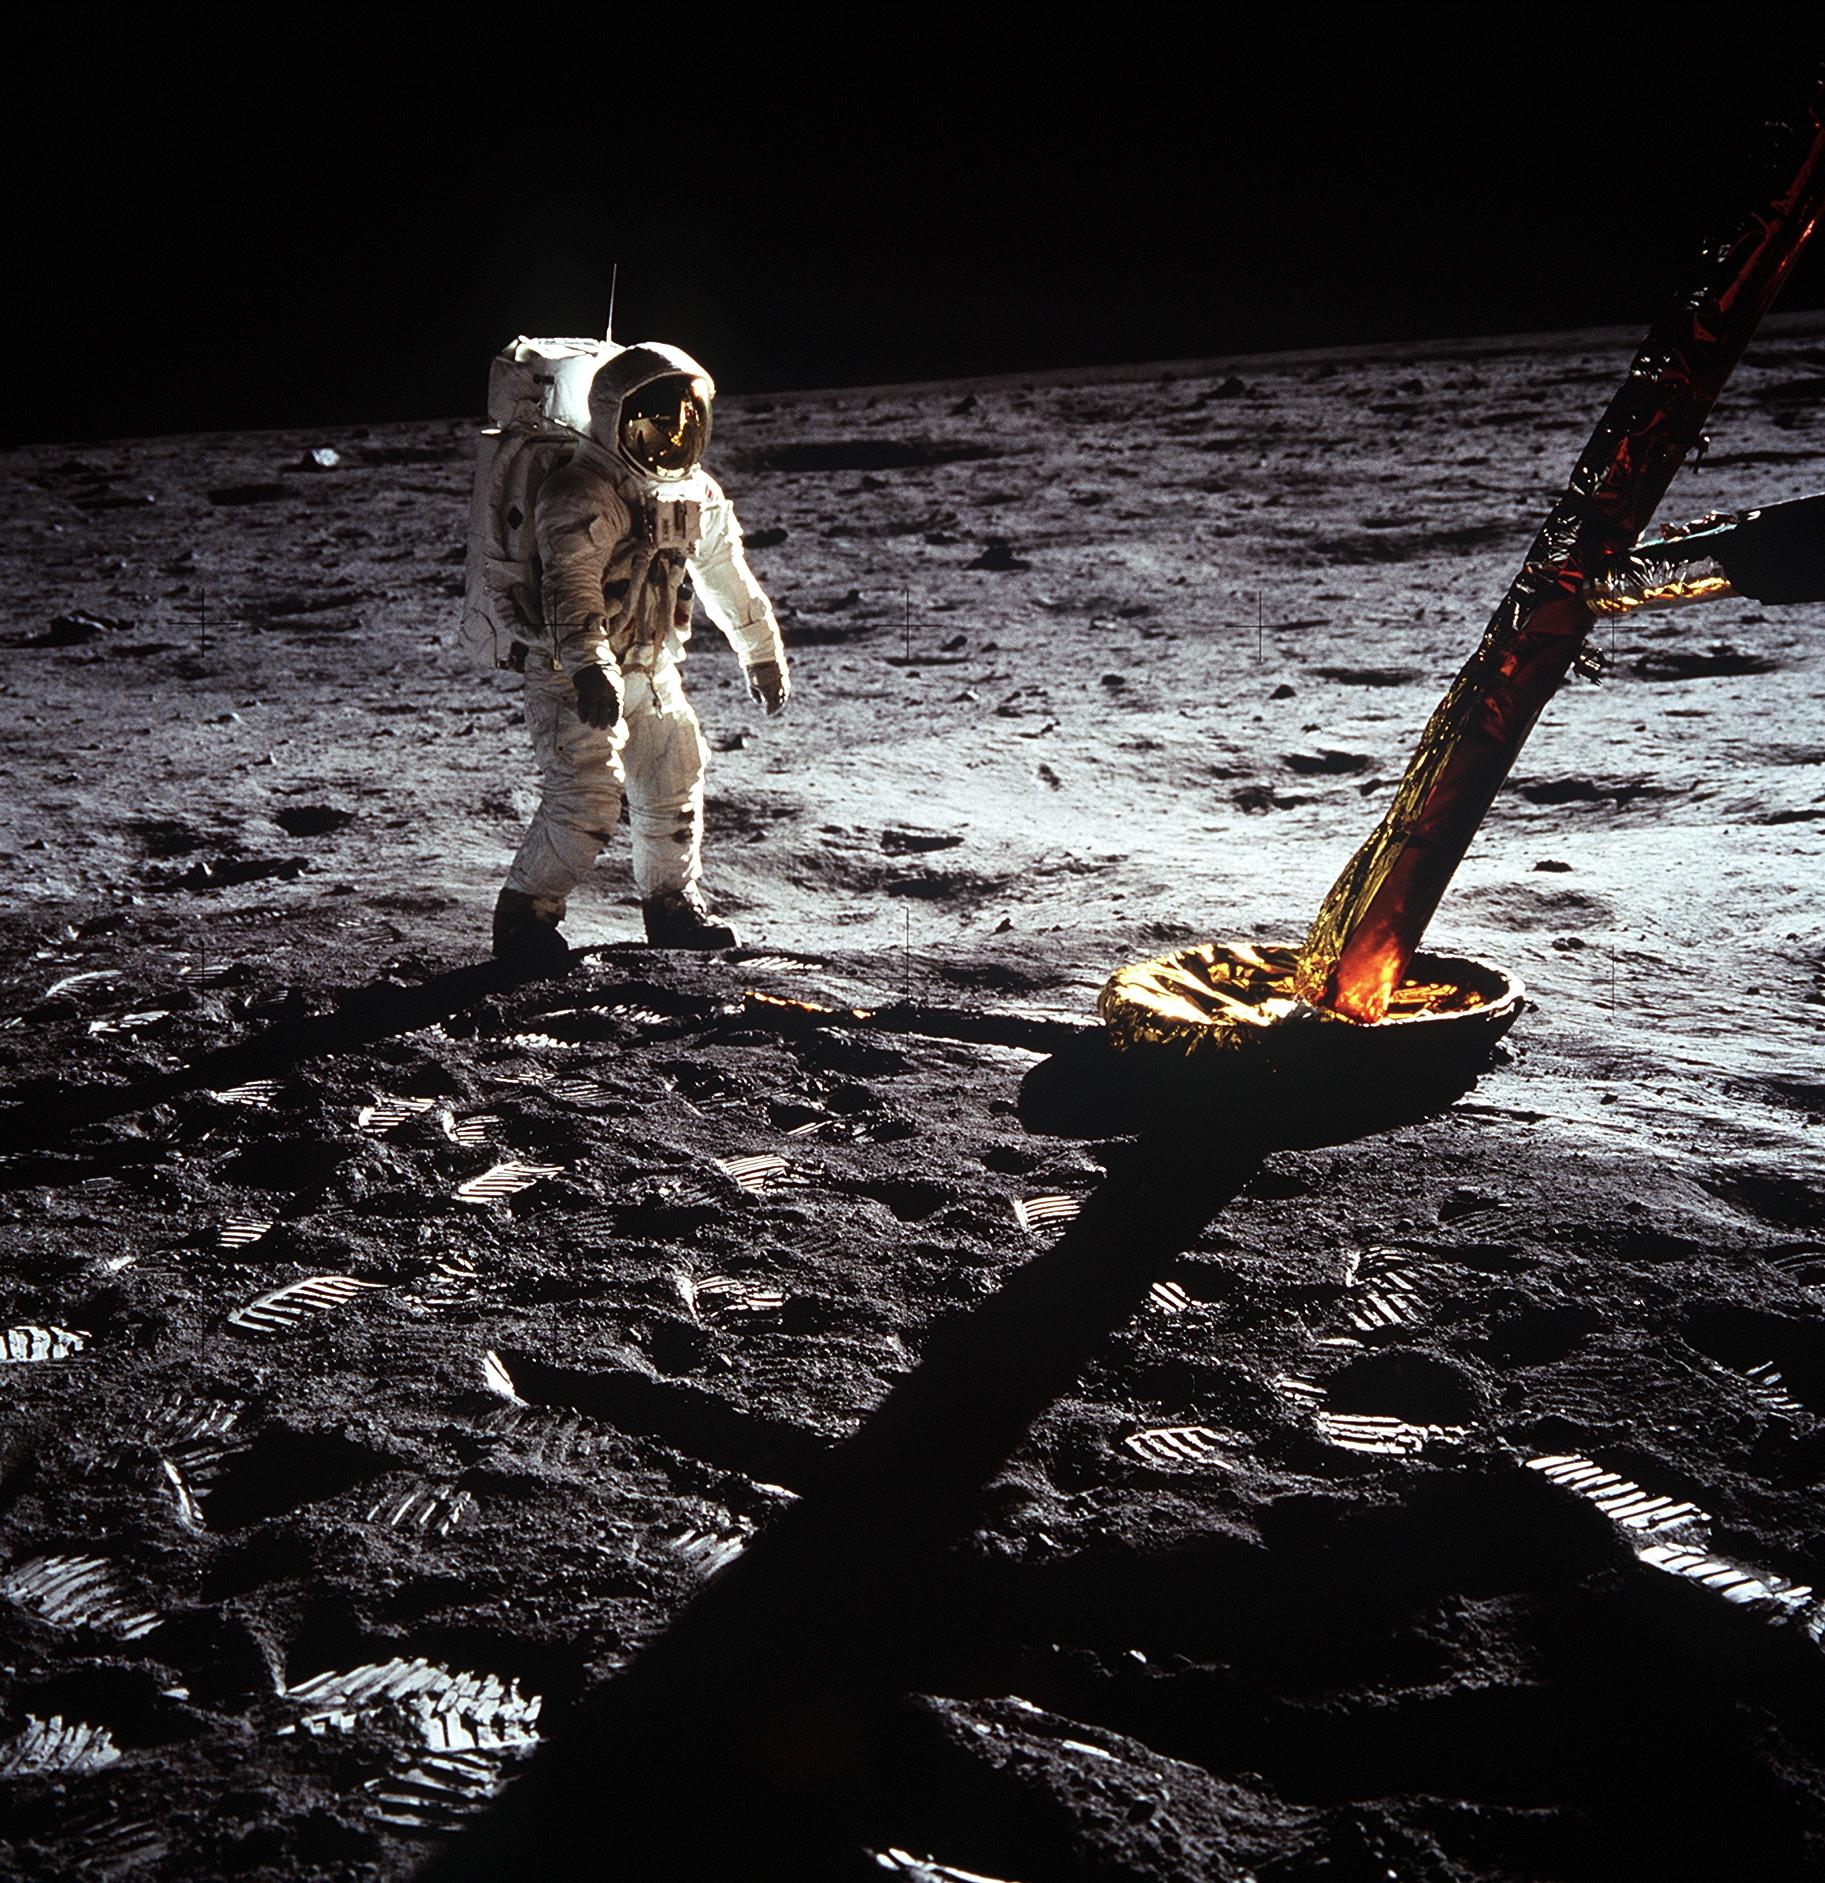 Astronaut Edwin Aldrin walks on lunar surface near leg of Lunar Module